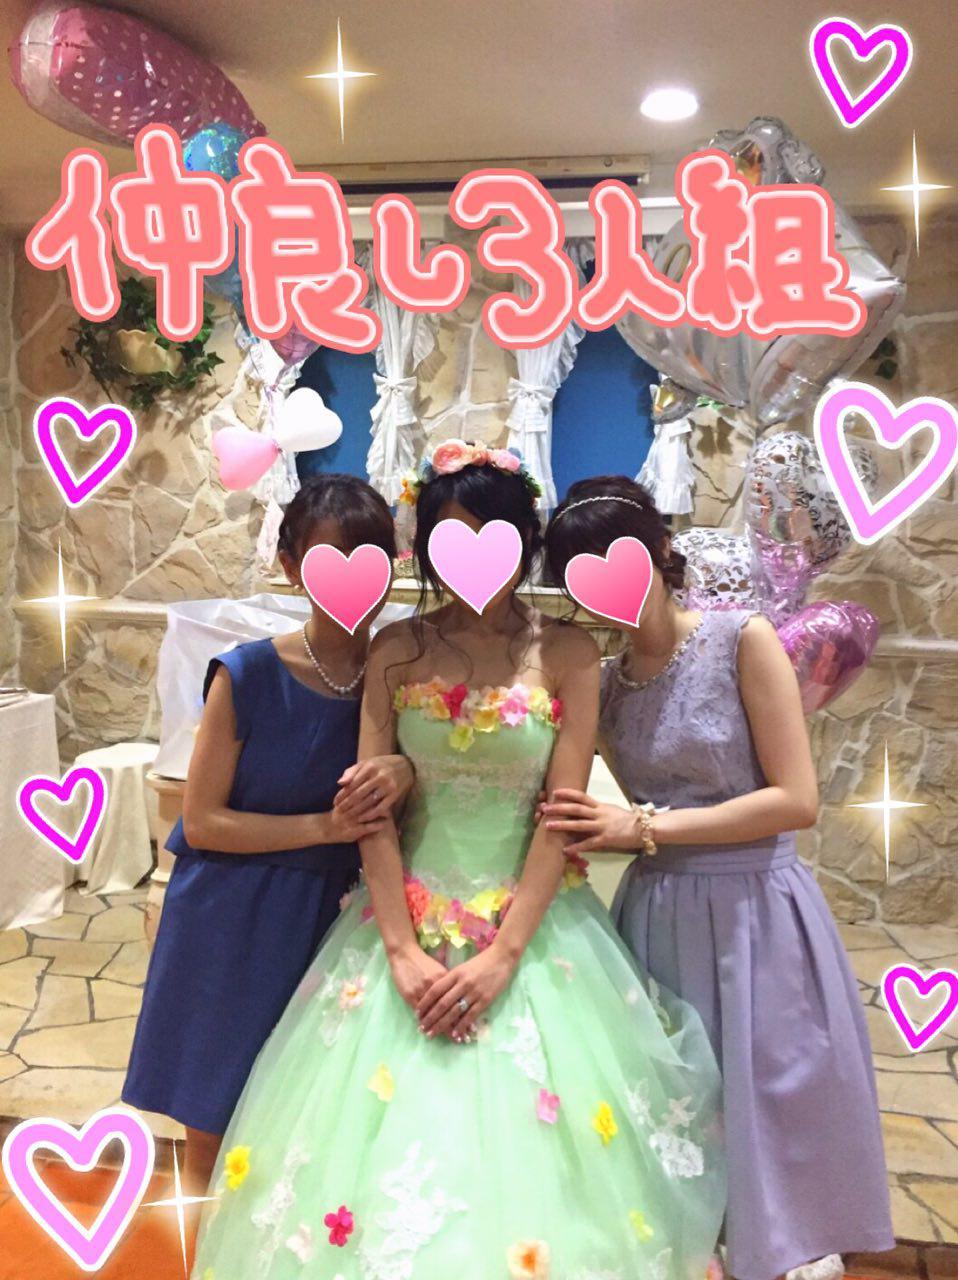 photo_2017-05-03_00-15-52.jpg